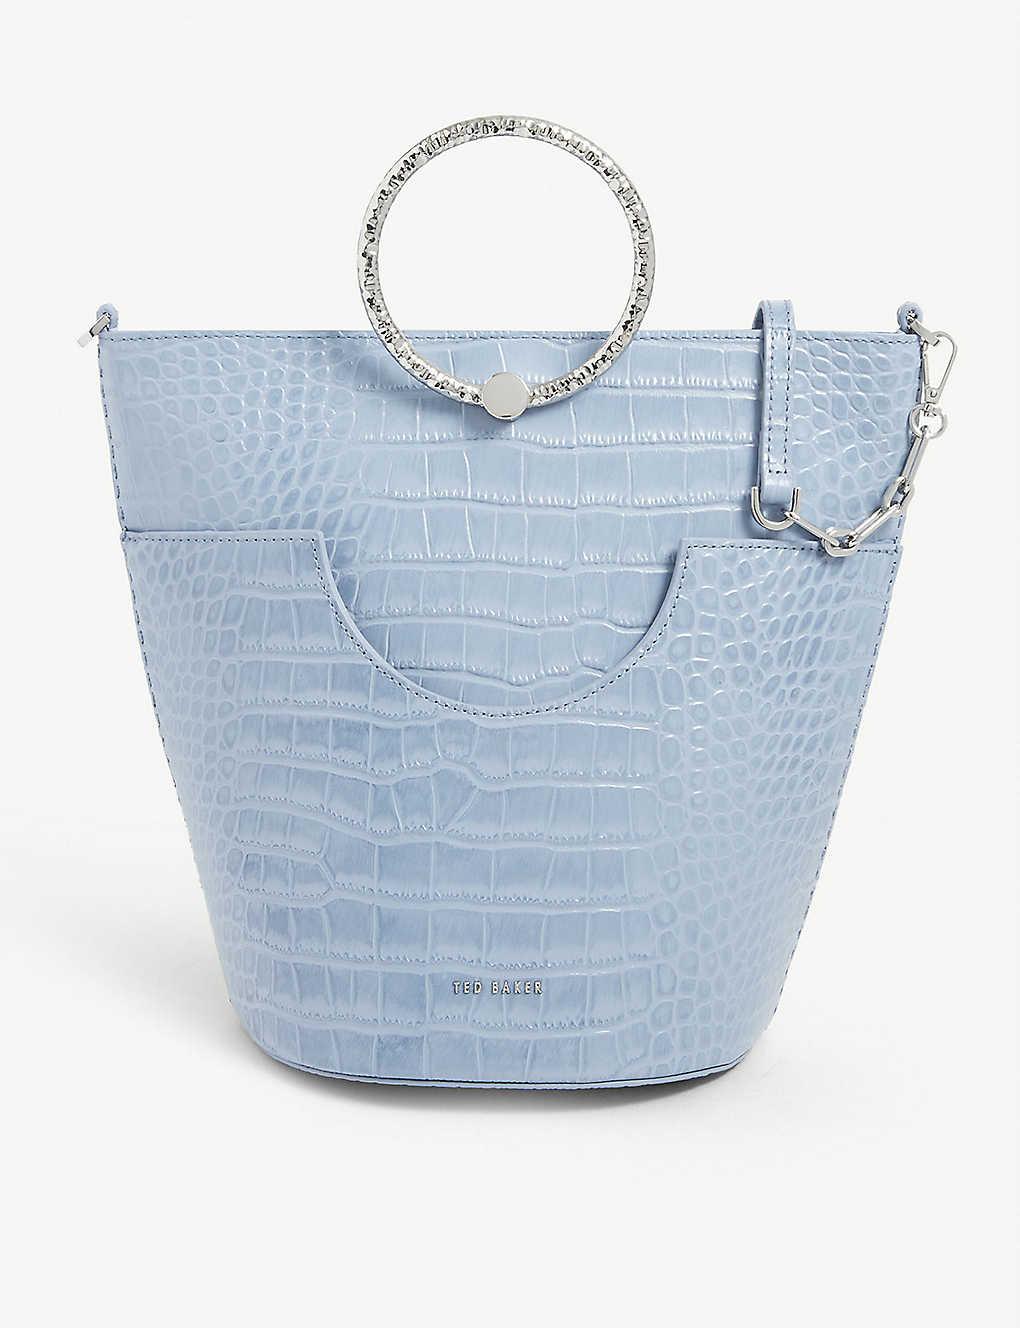 TED BAKER: Leather circular handle bucket bag